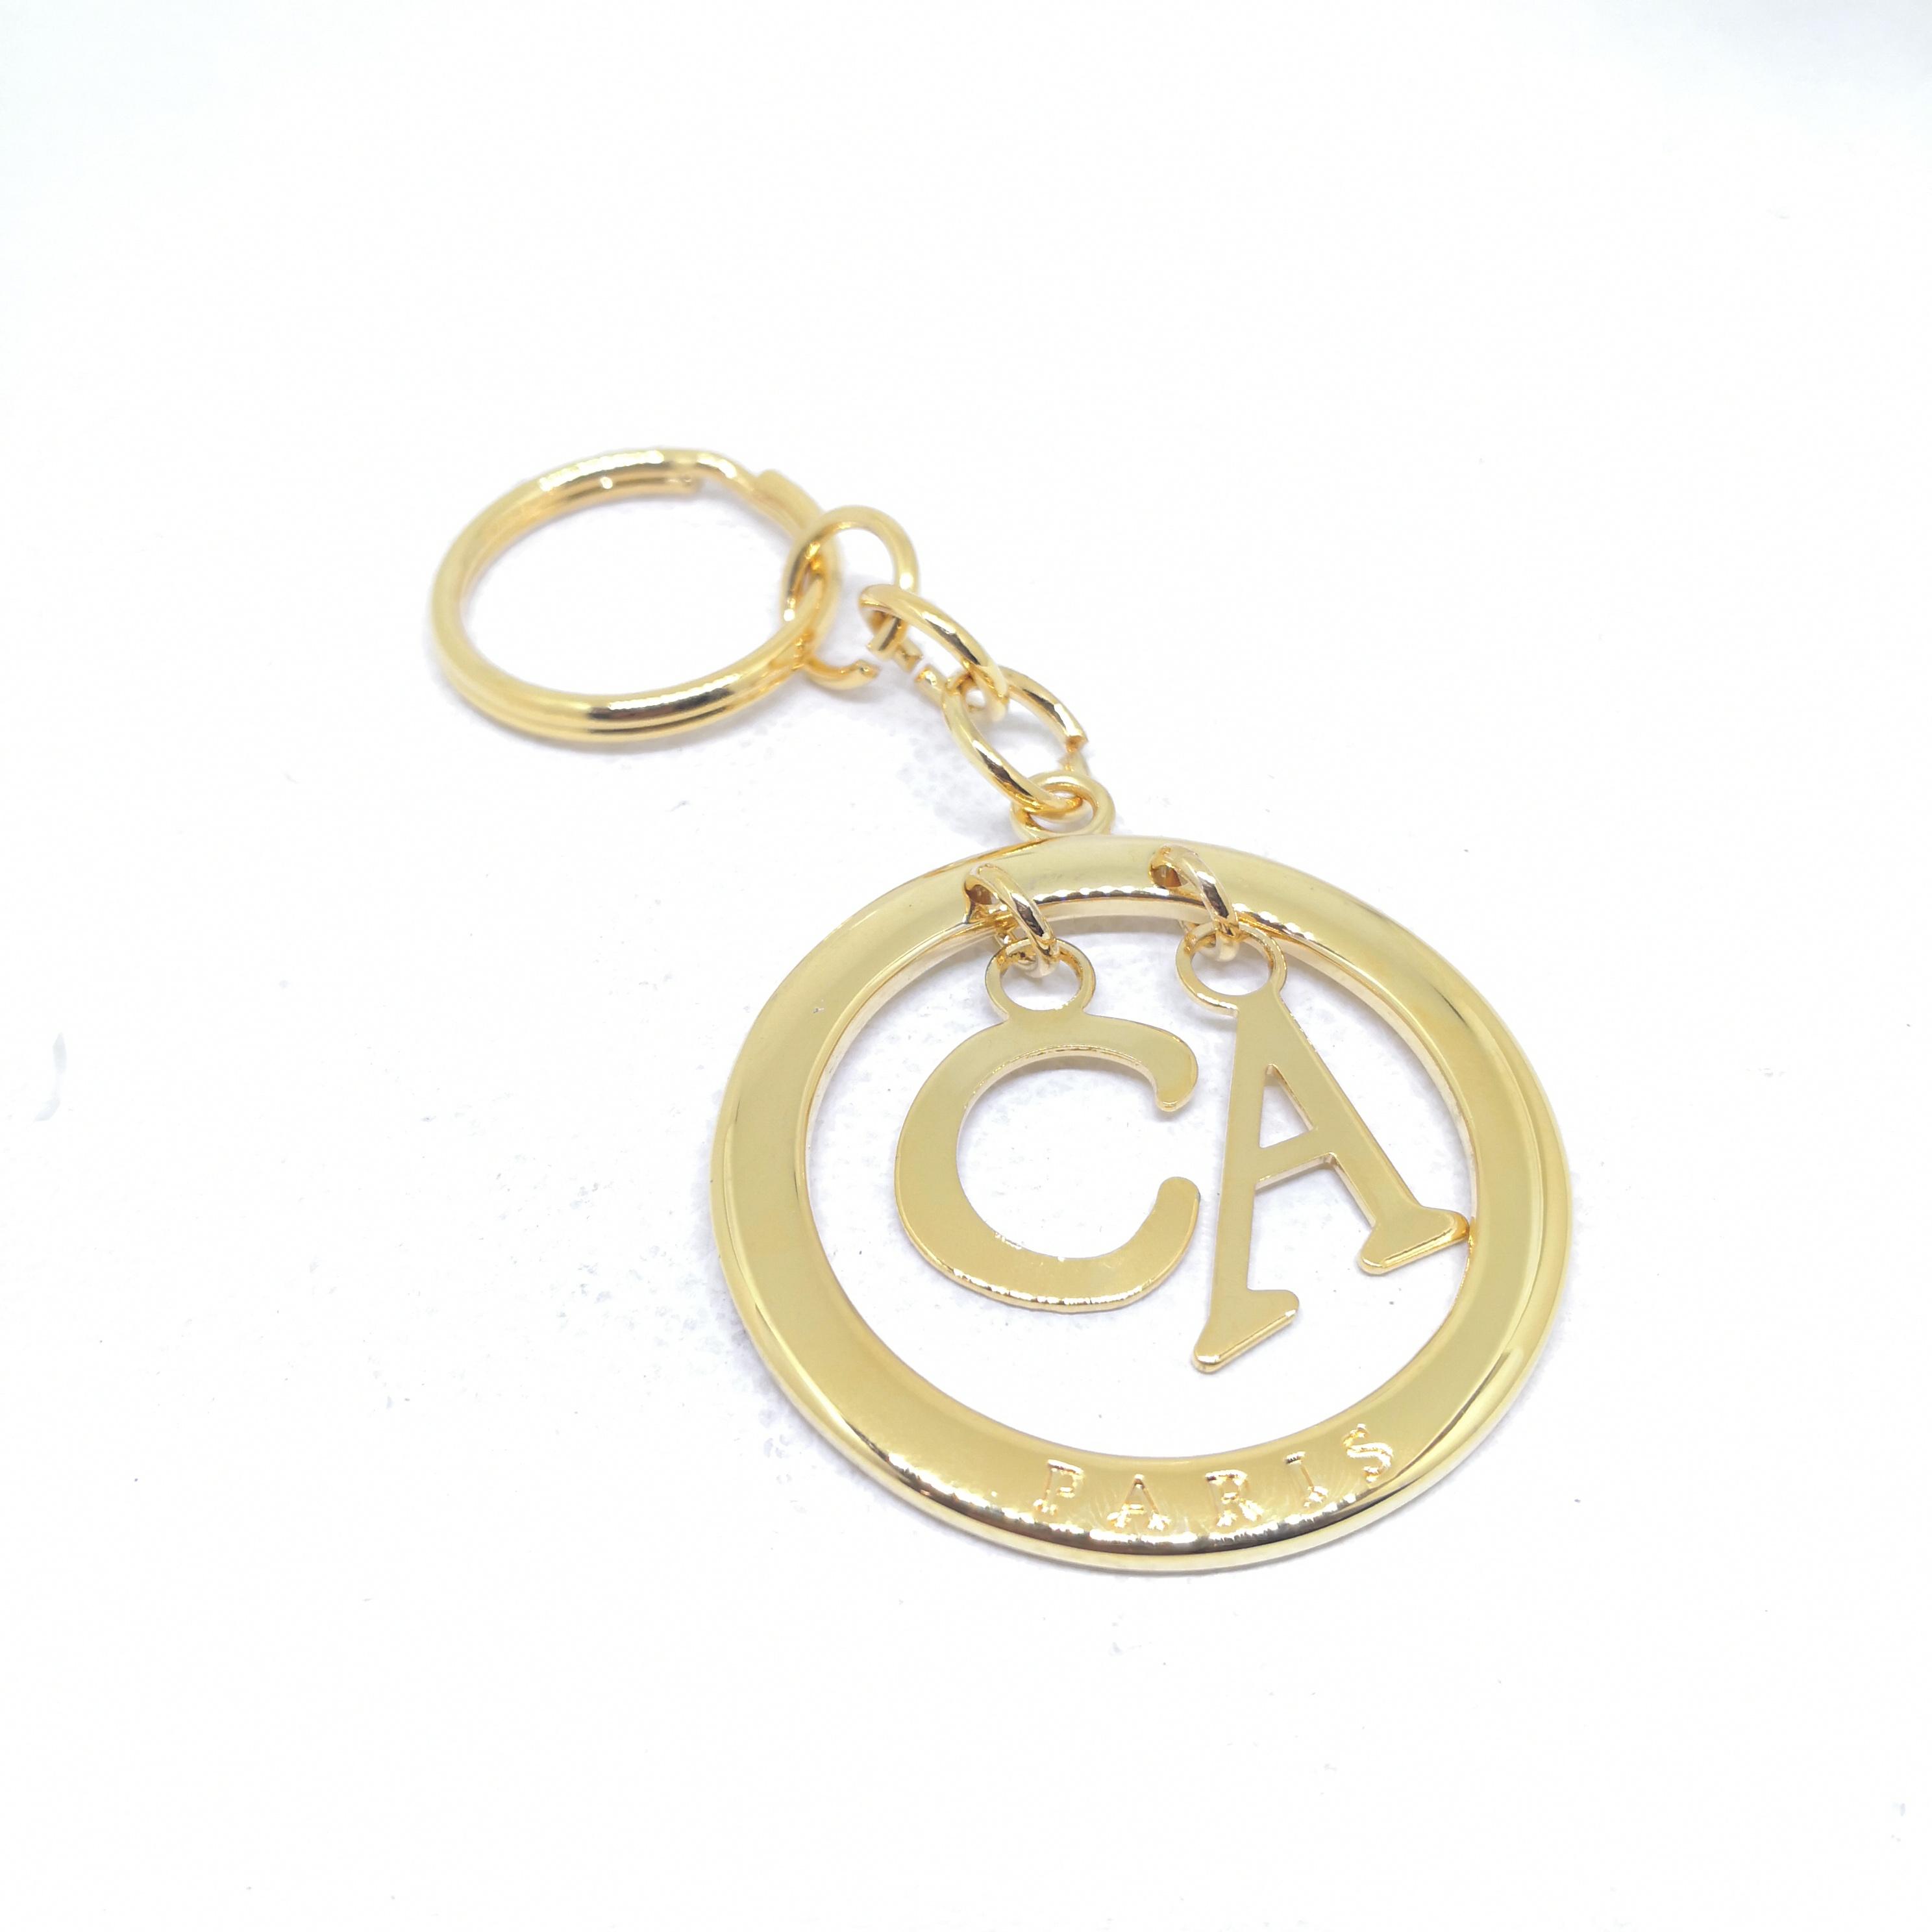 Key Ring - CA